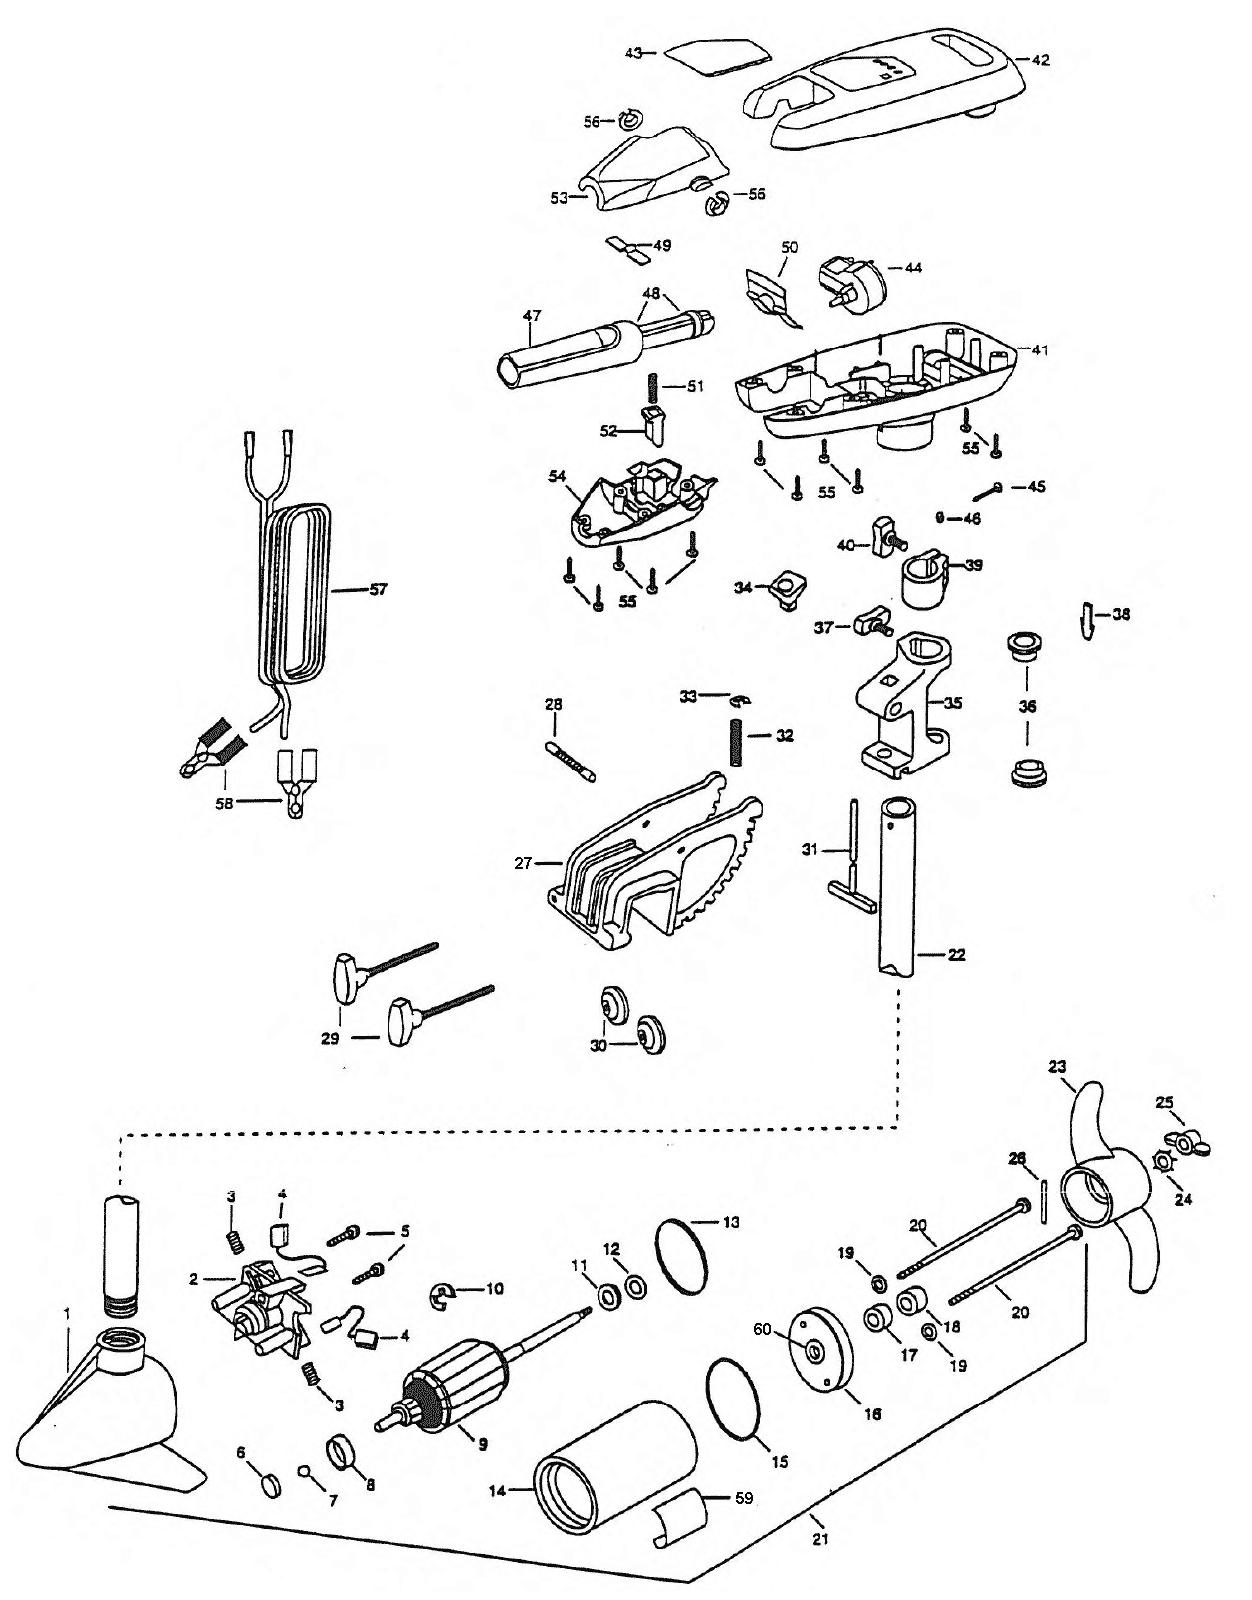 Minn Kota Turbo 40 Parts